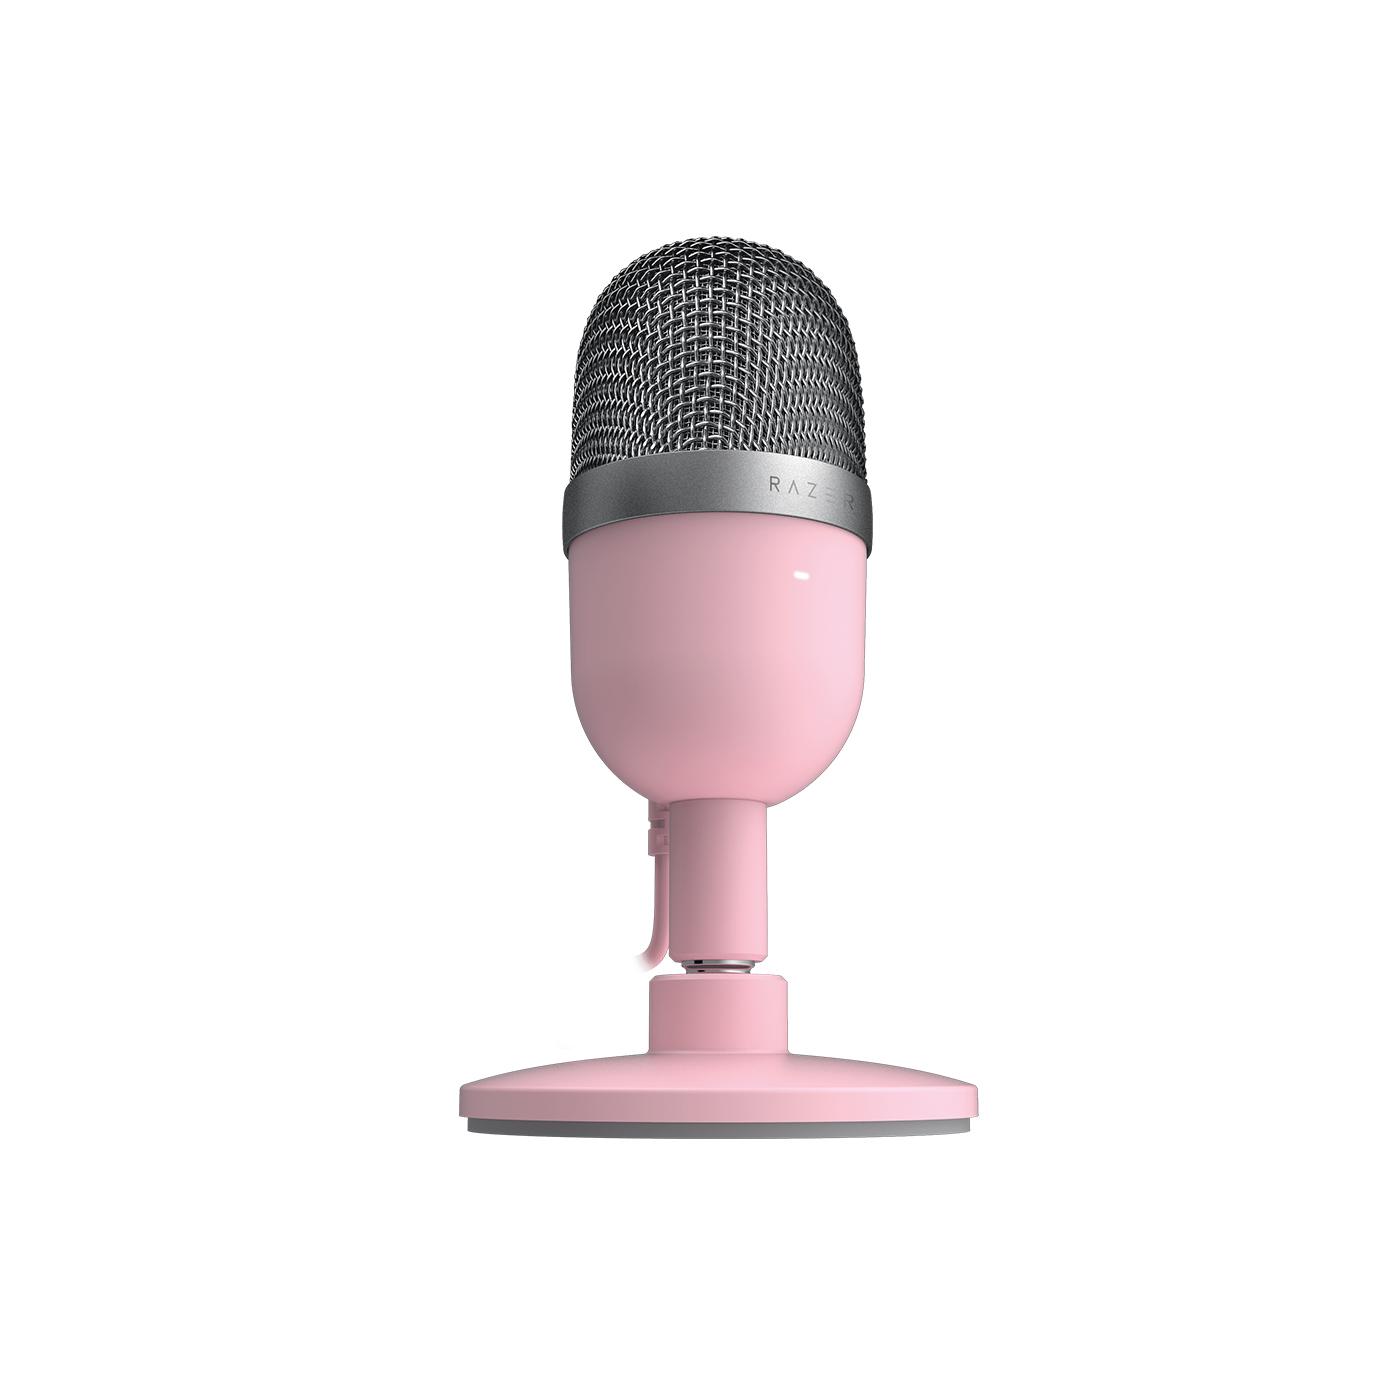 Razer SEIREN MINI QUARTZ PC/PS4/PS5/MAC USB Microphone with Shockmount - Razer 1.28.80.26.158